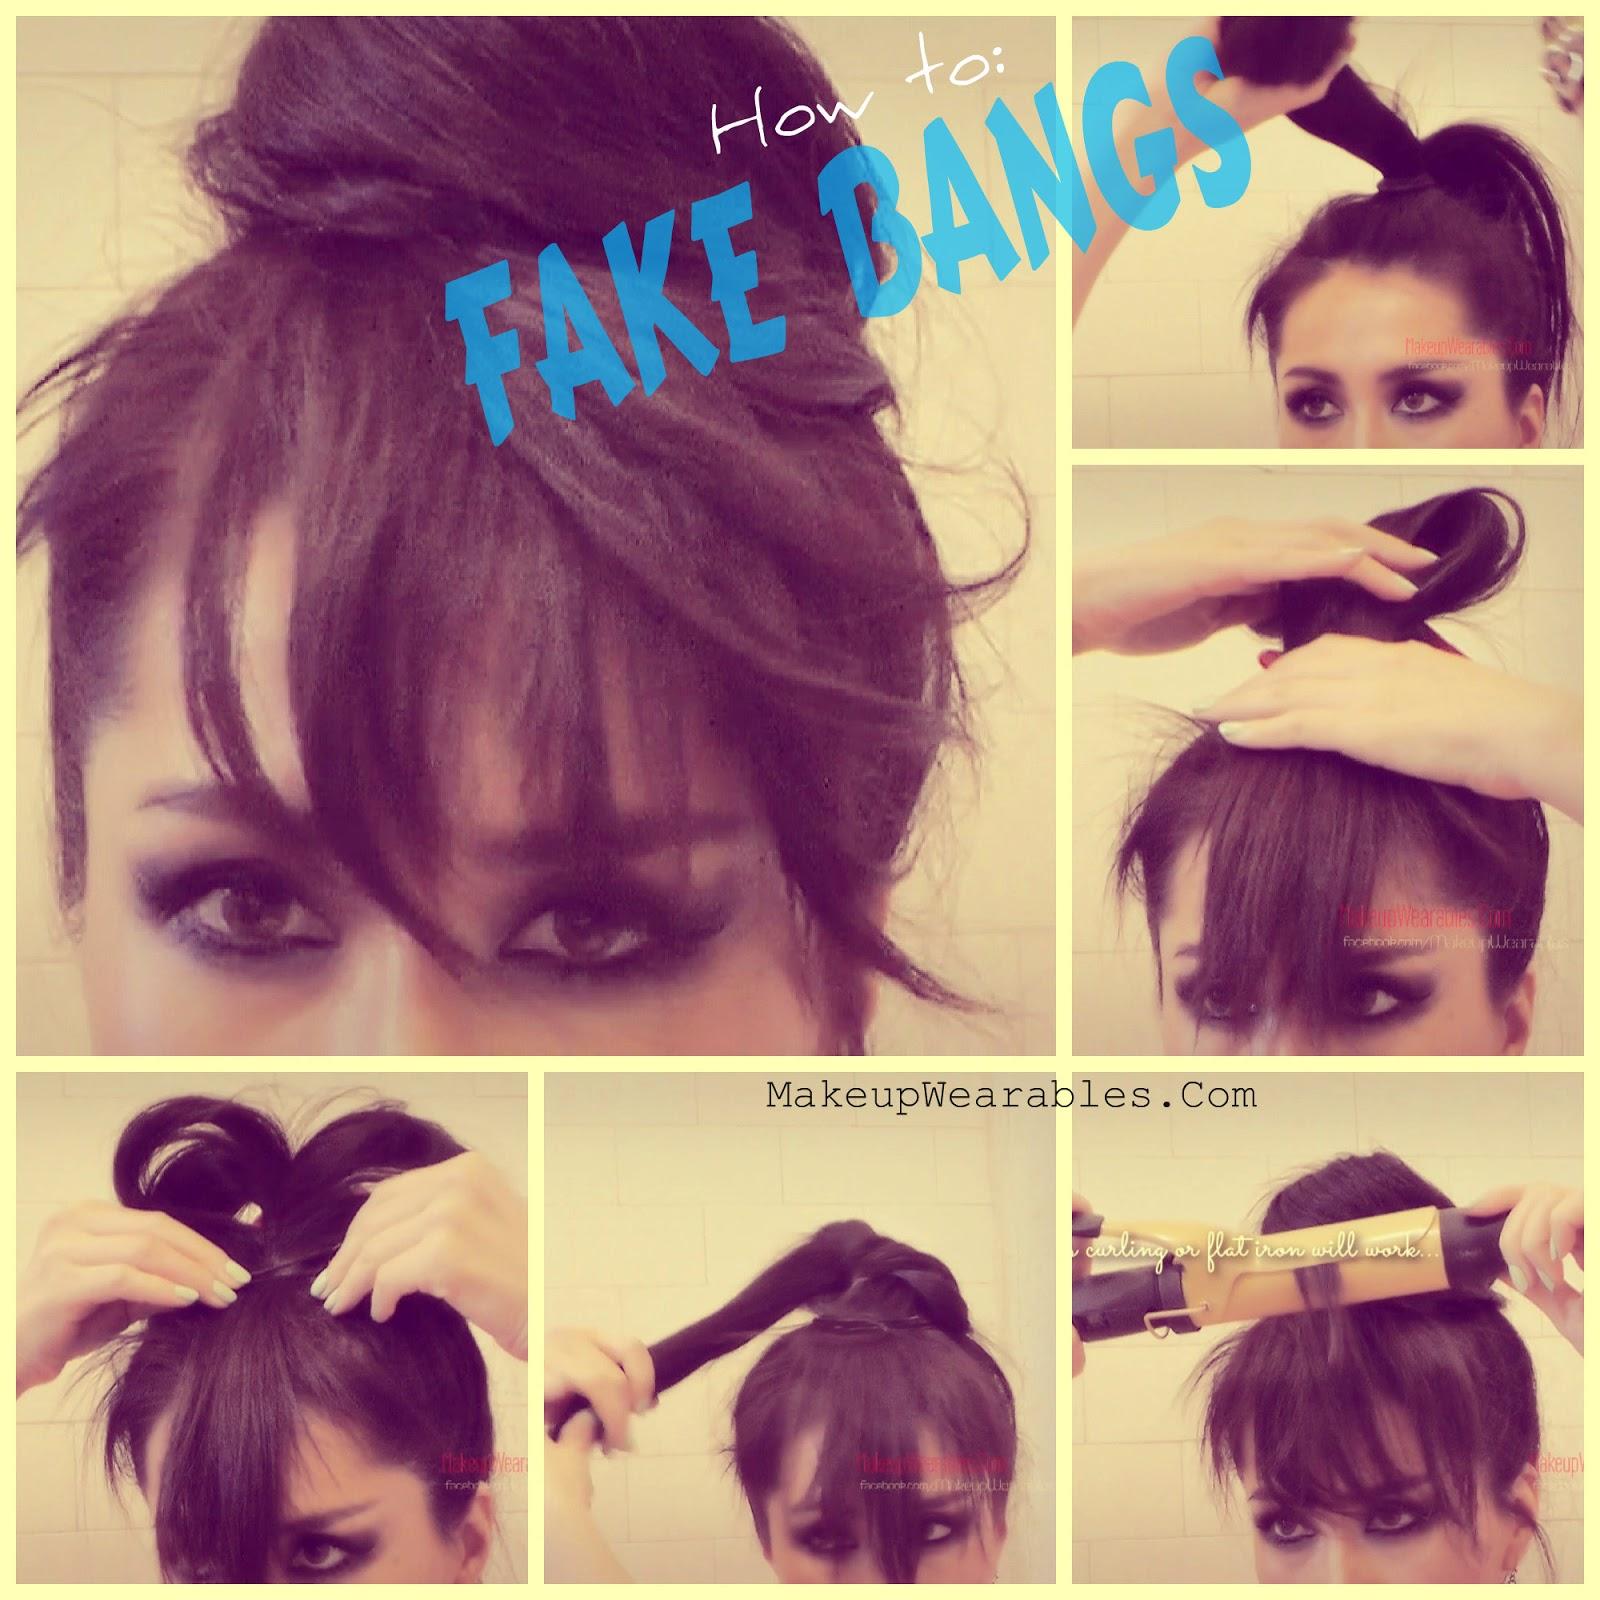 Amazing How To Fake Bangs Cute Easy Bun Hairstyles Hair Tutorial Video Short Hairstyles For Black Women Fulllsitofus